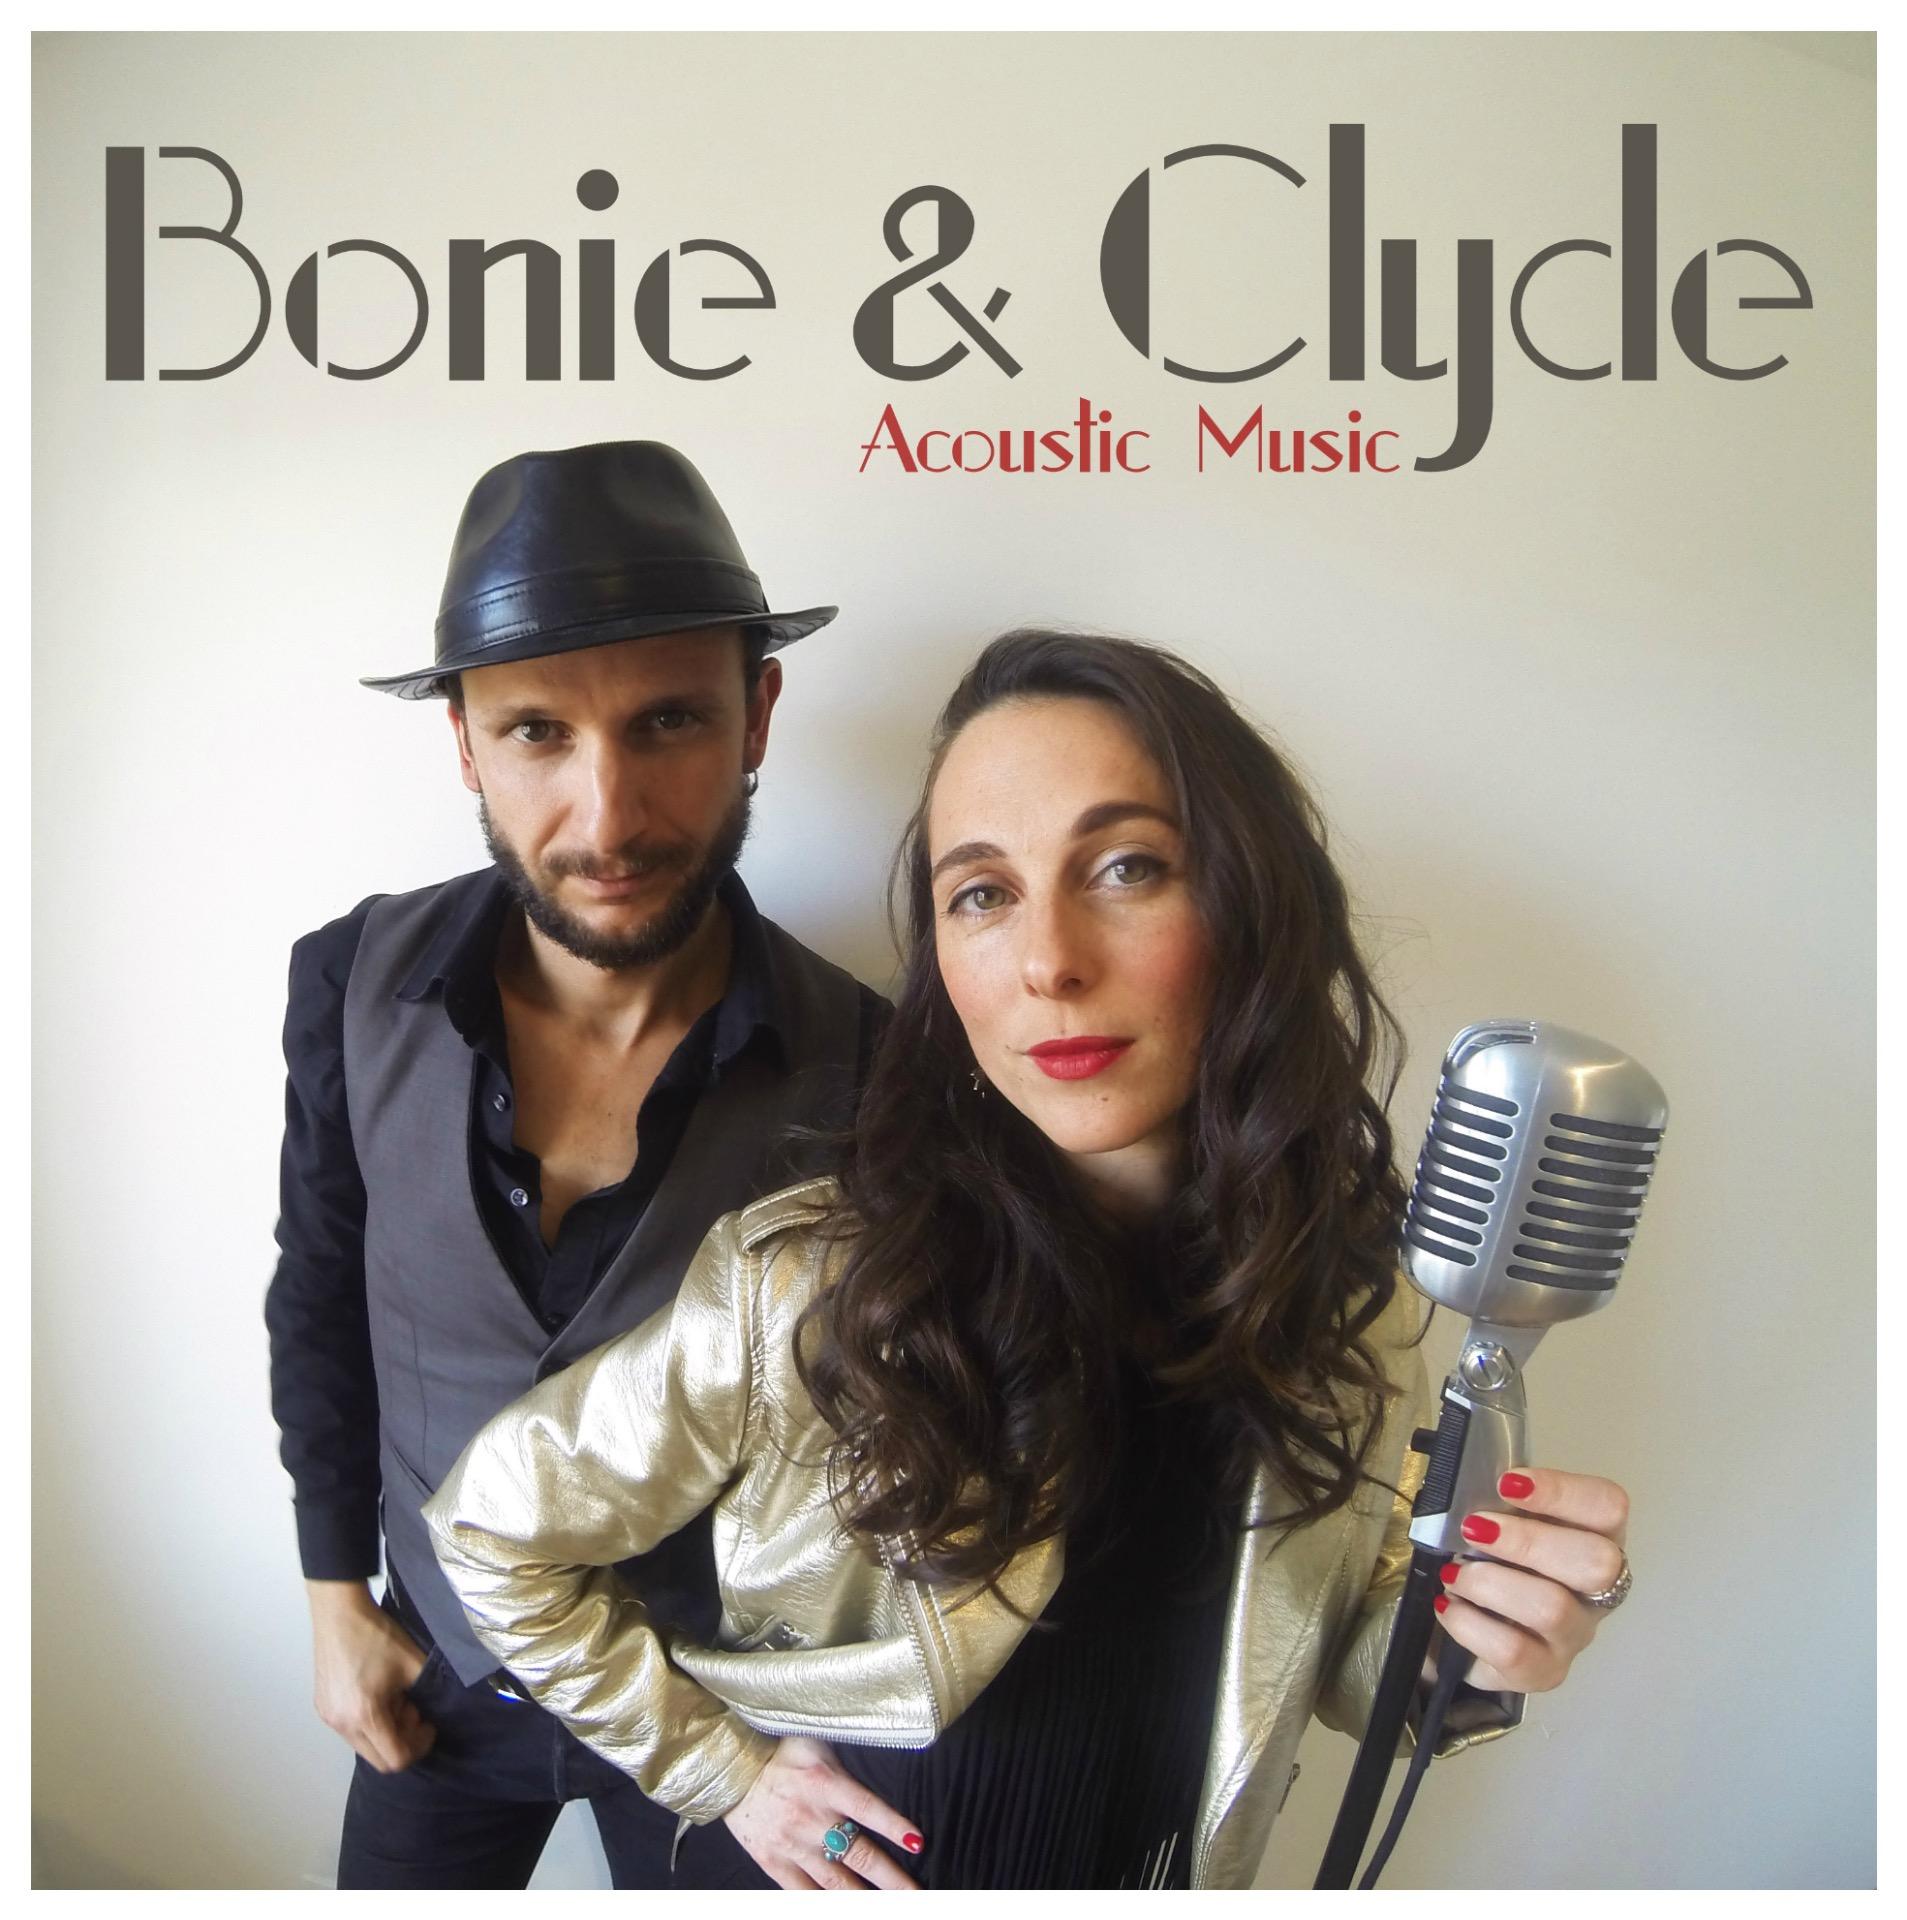 Bonie & Clyde Acoustic | Concert-Dîner